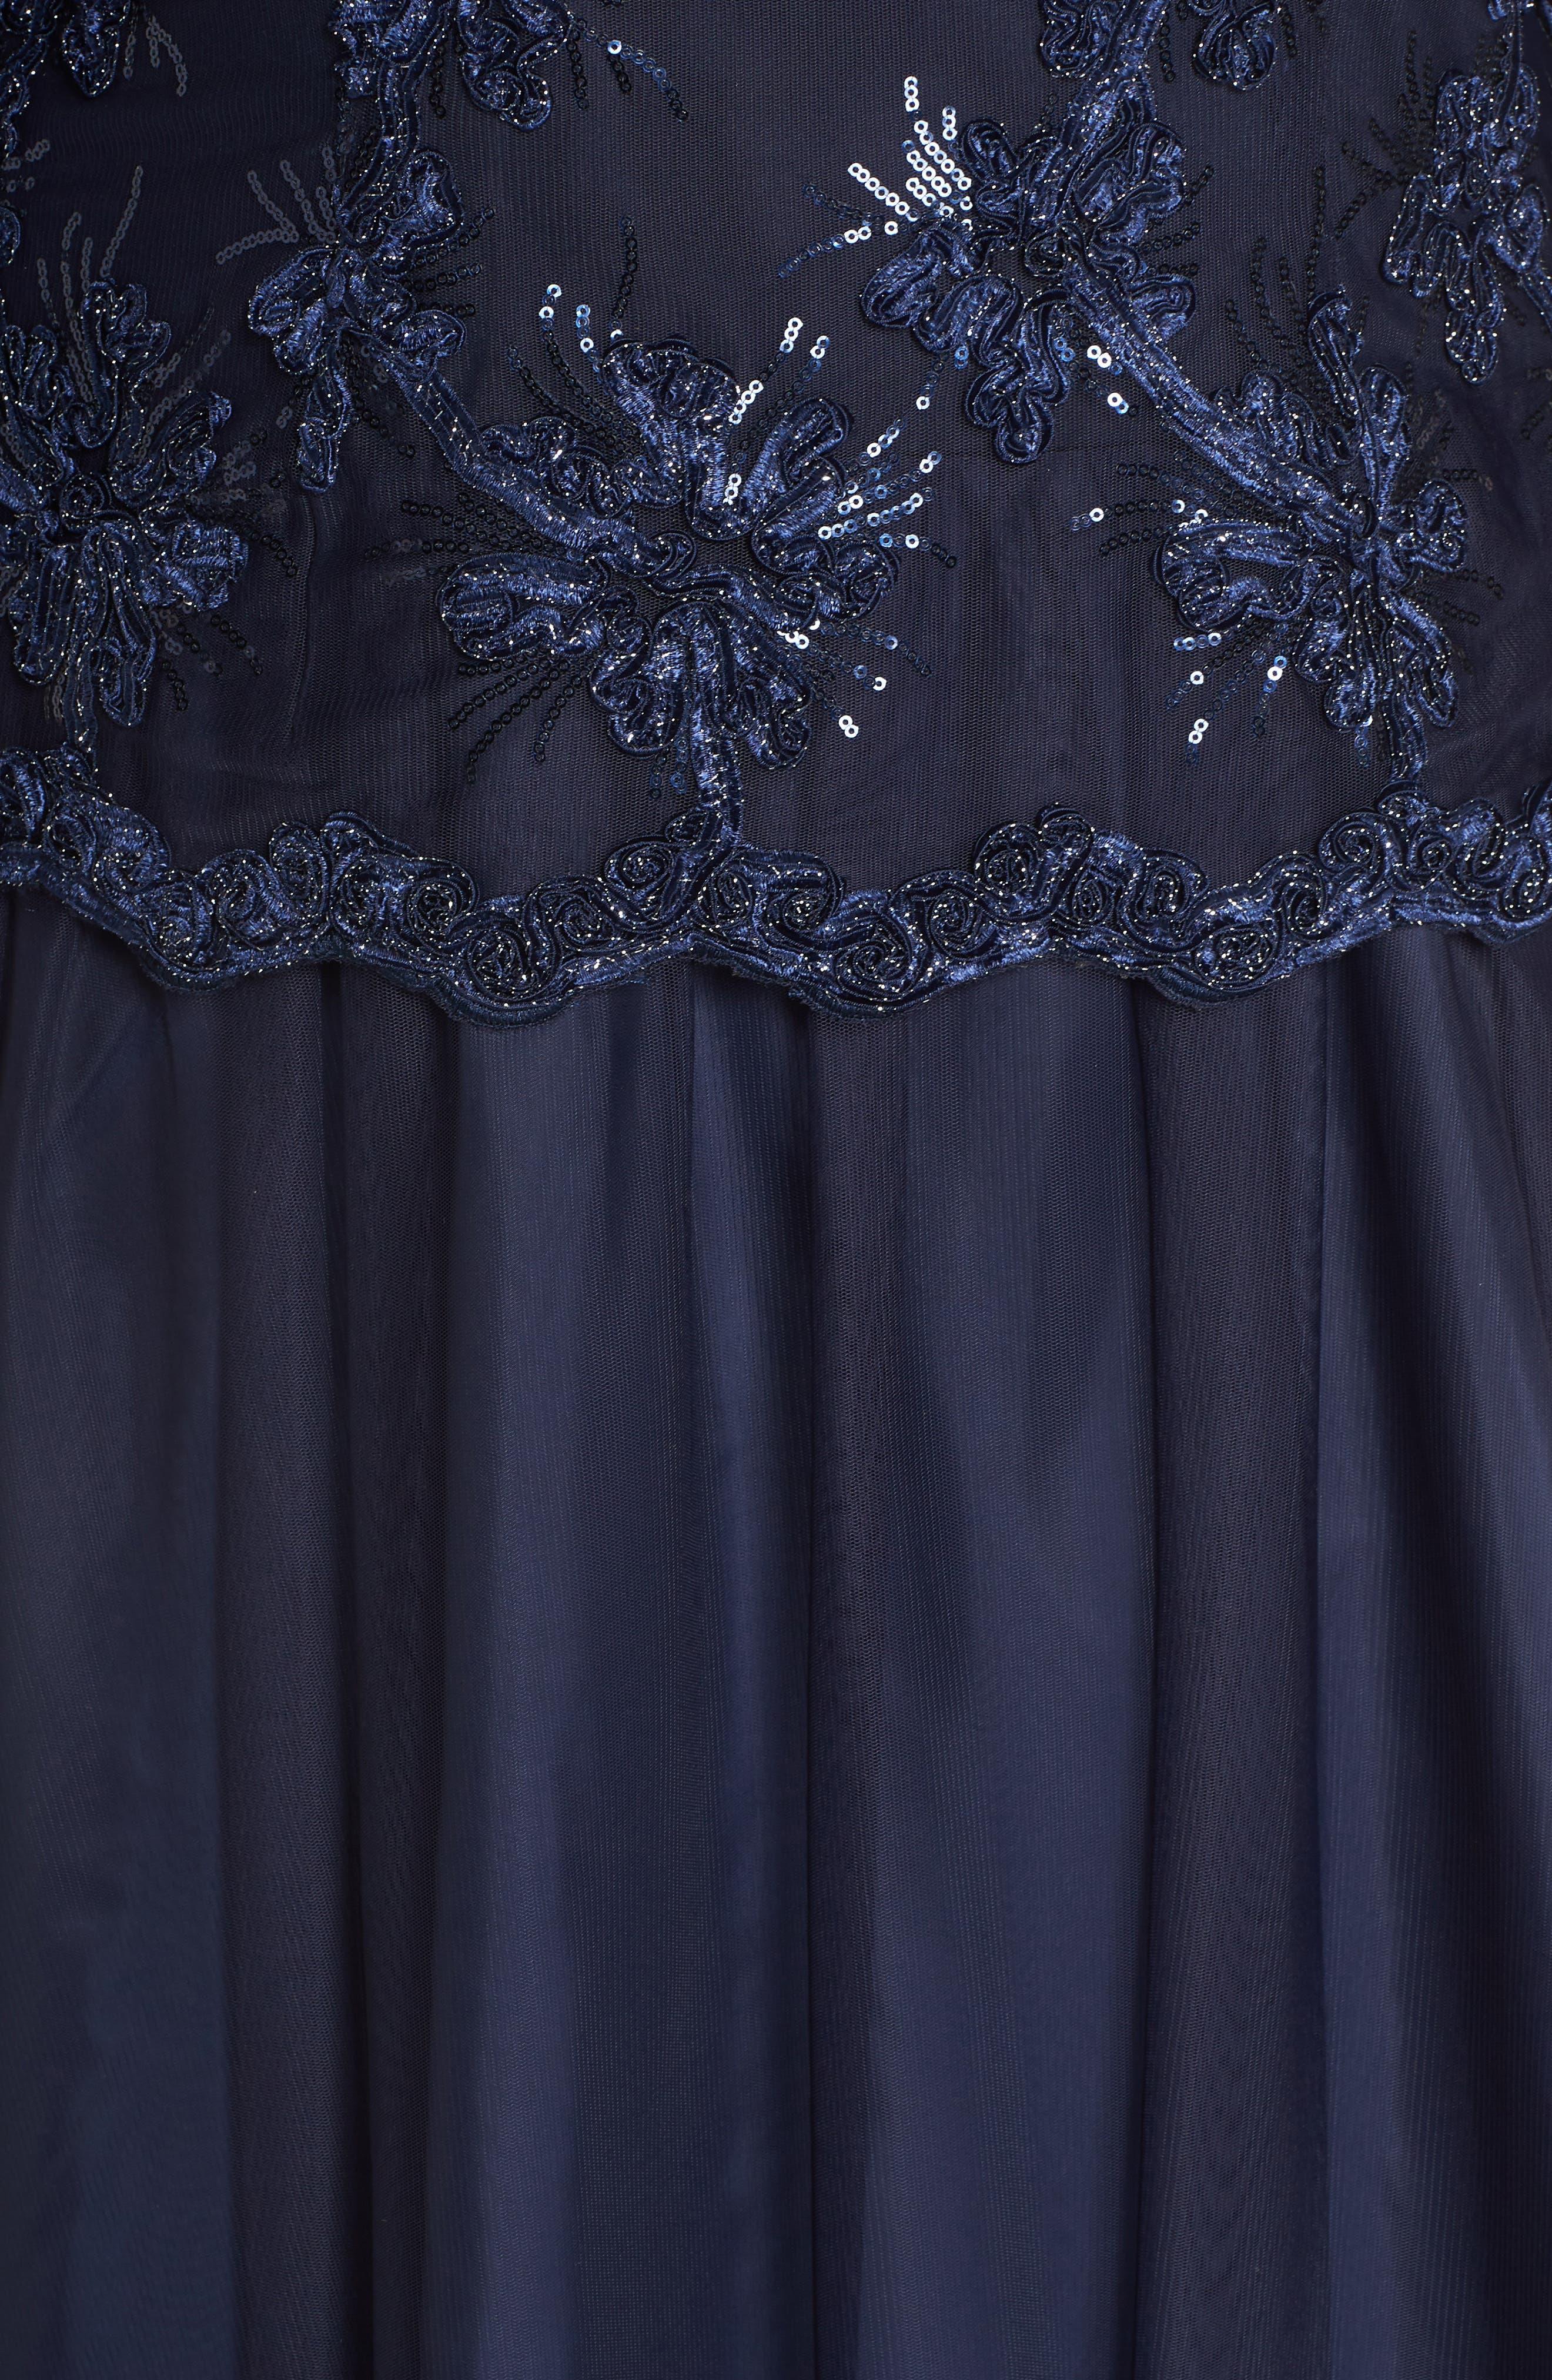 Embellished Bodice Tea Length Mesh Dress,                             Alternate thumbnail 5, color,                             Navy